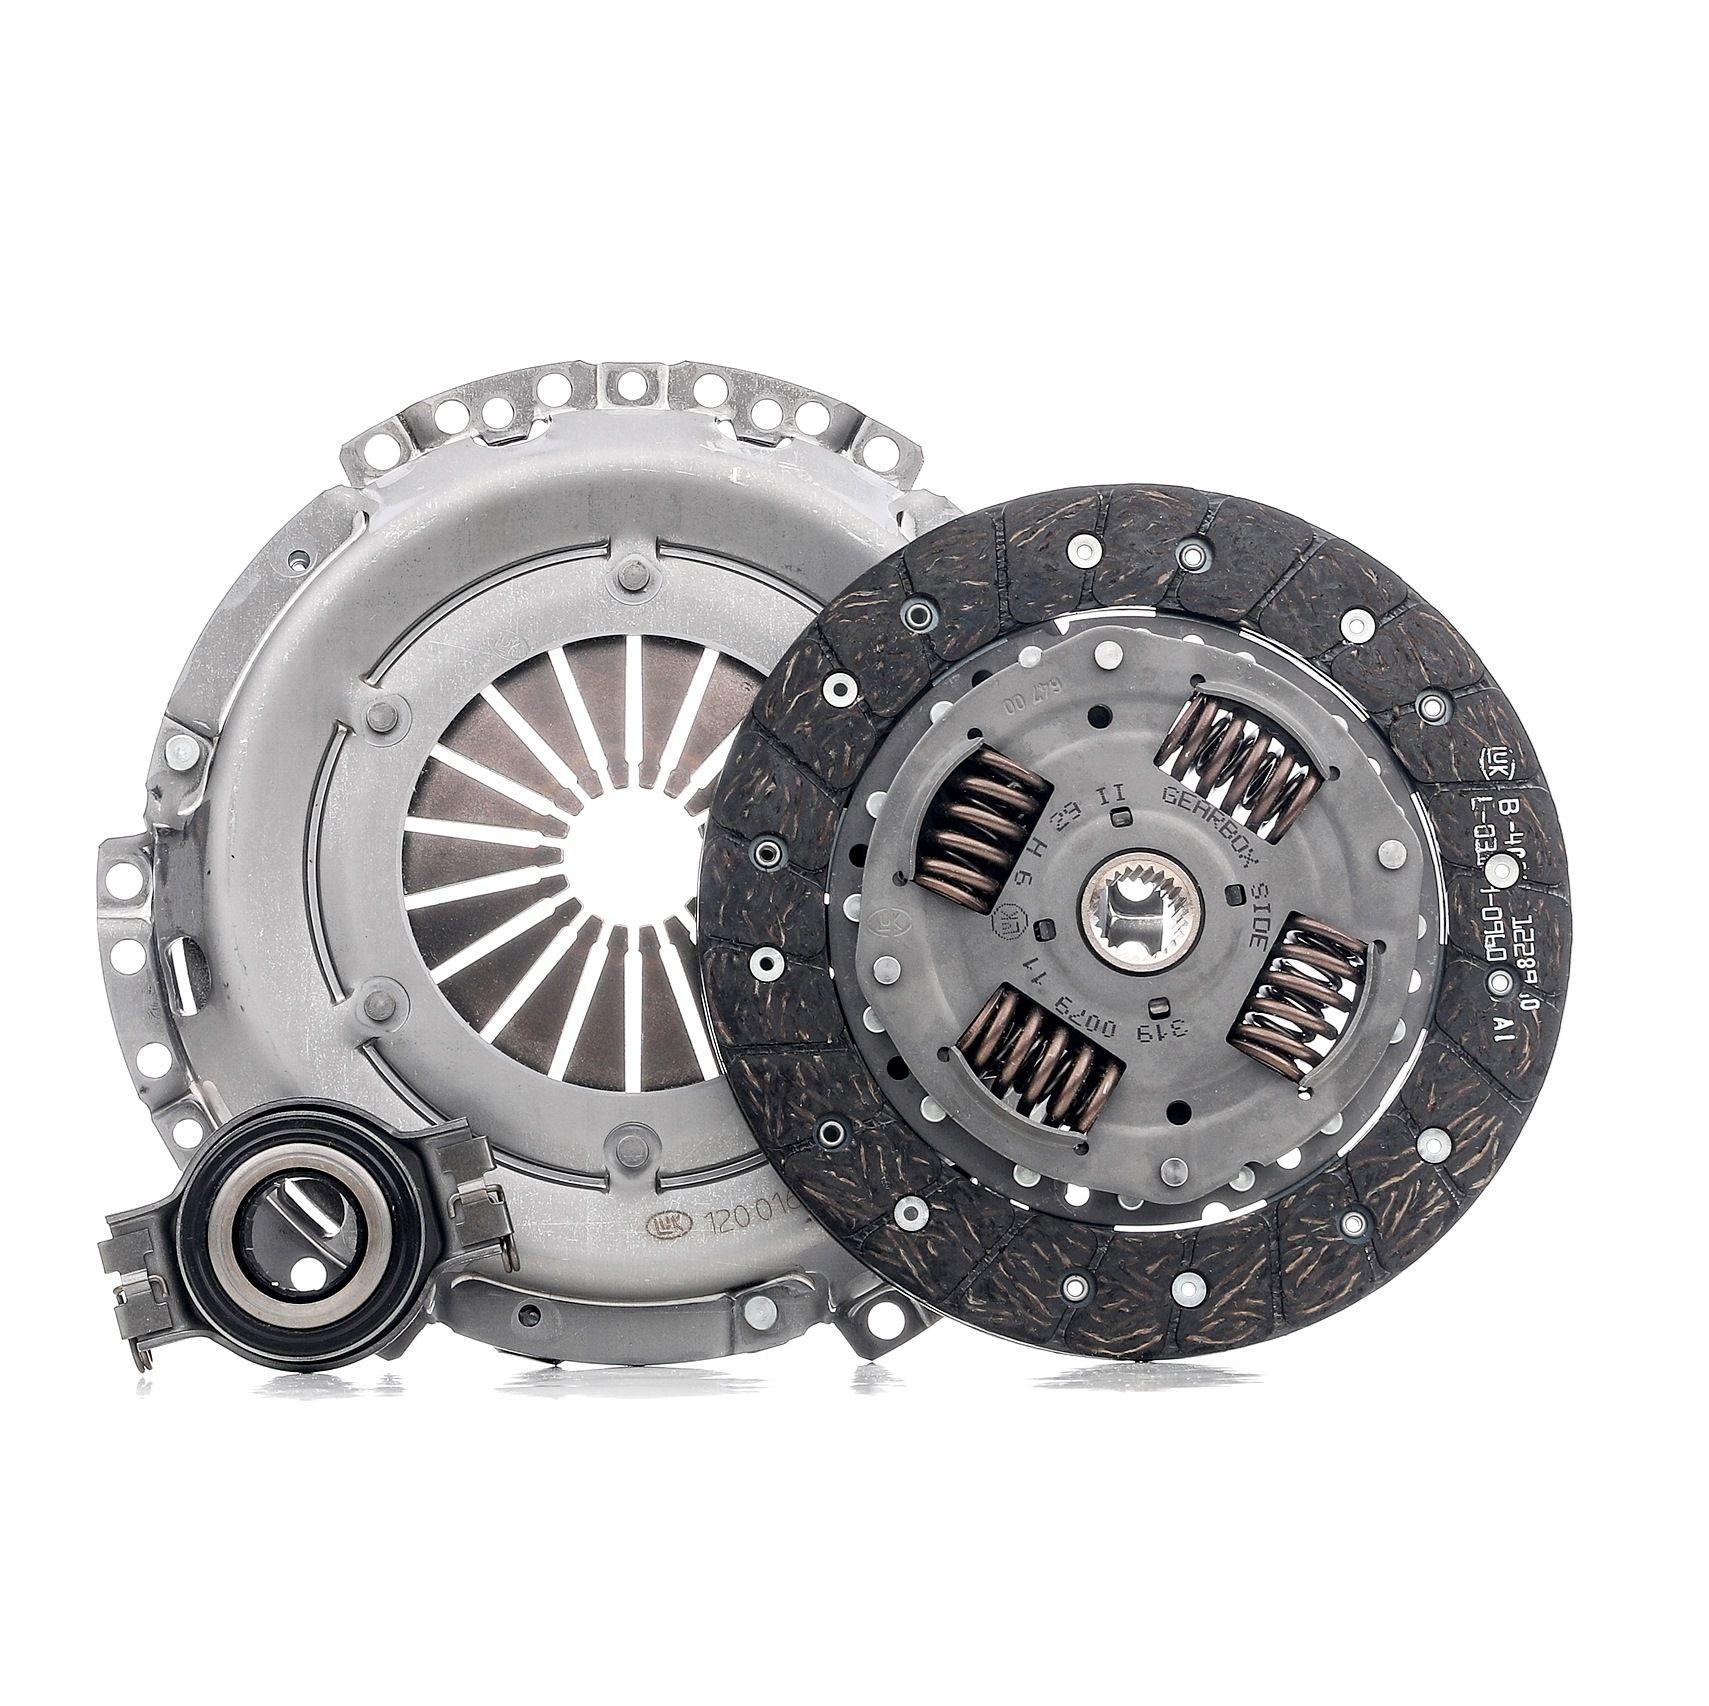 VW POLO 2015 Kupplungssystem - Original LuK 620 1943 00 Ø: 200mm